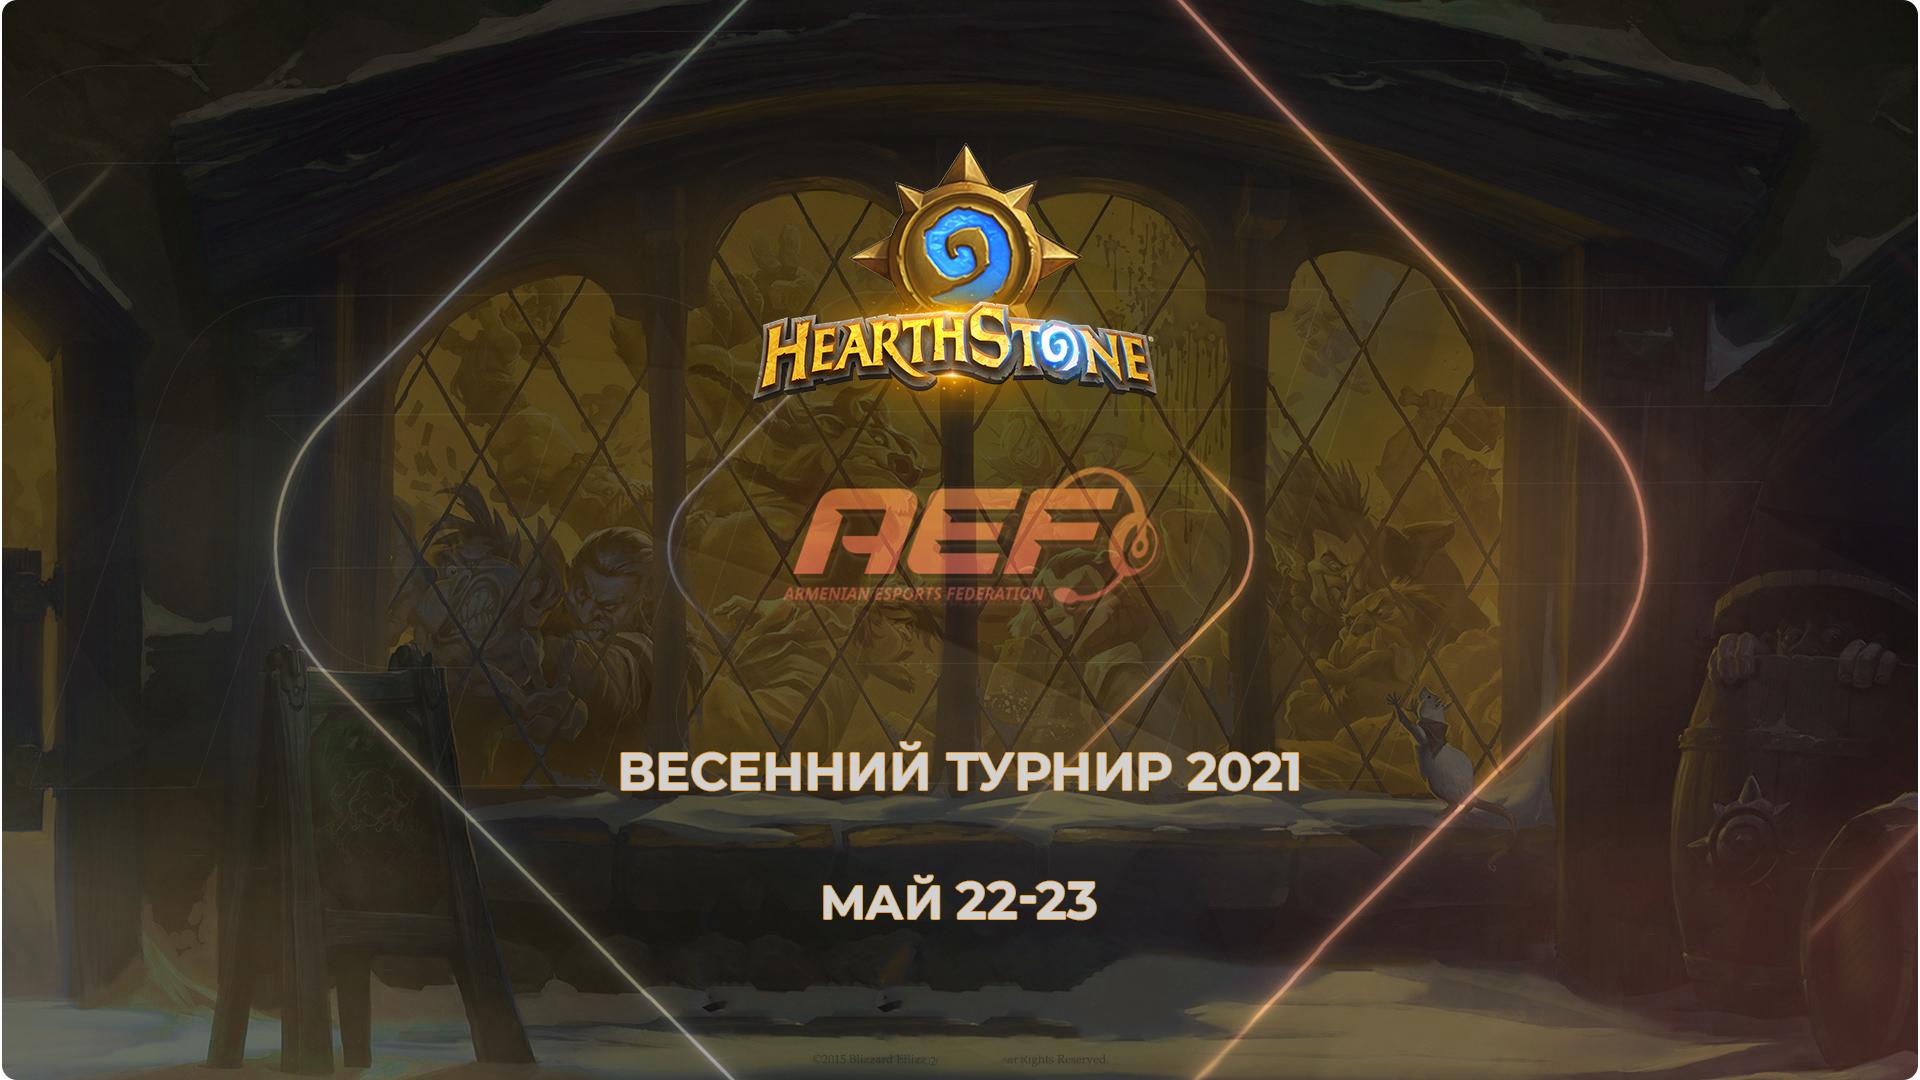 Регистрация на Весенний Чемпионат Hearthstone открыта